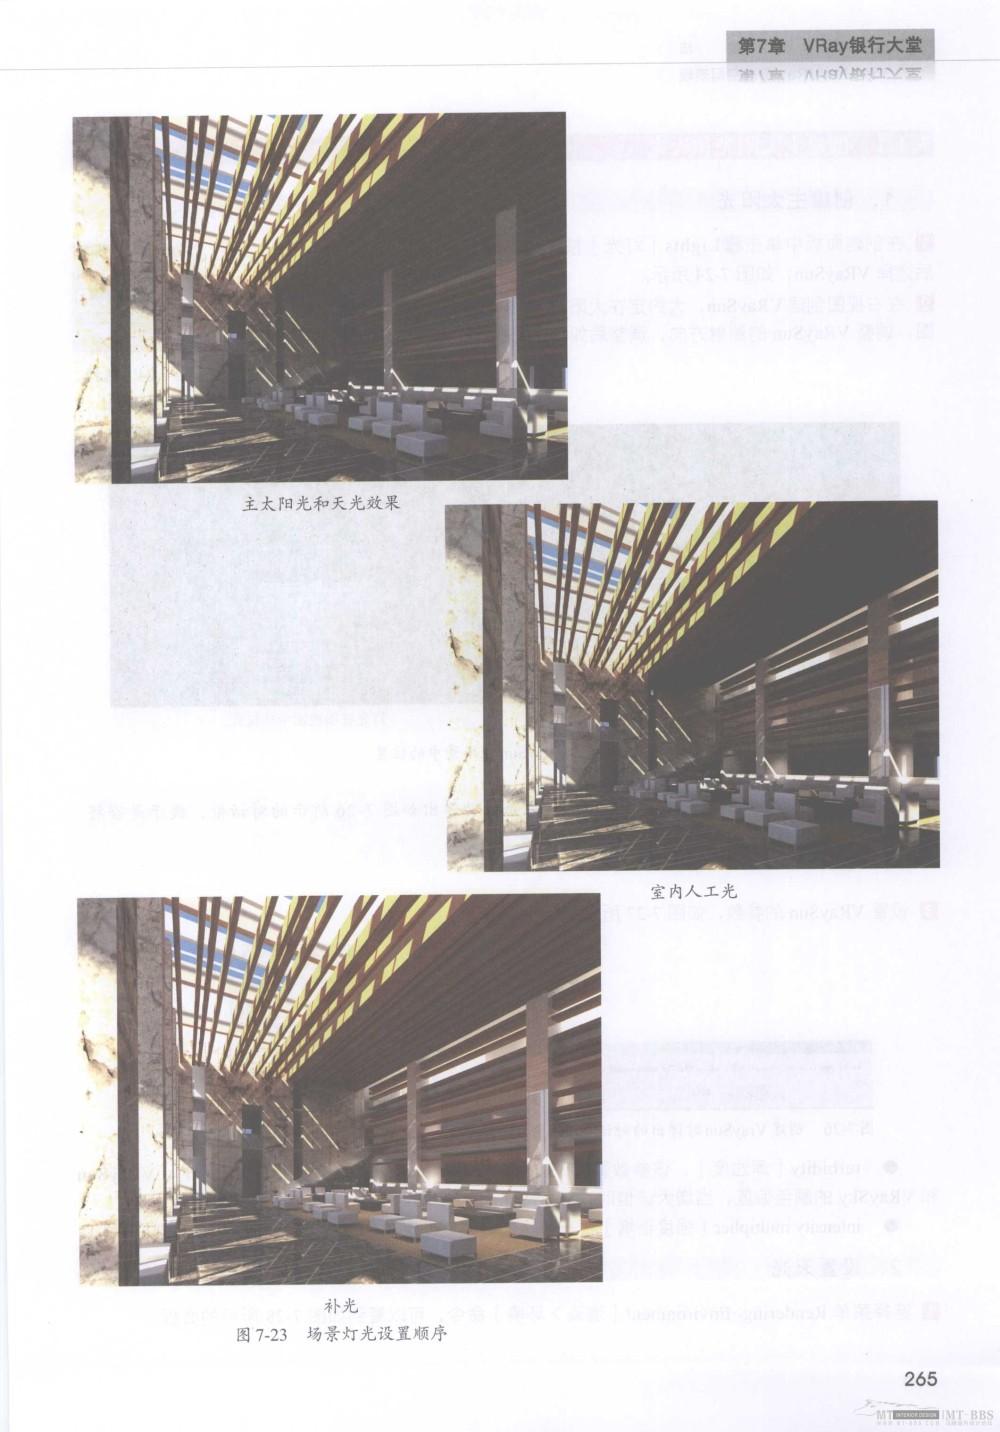 水晶石技法-3ds_Max&VRay室内空间表现_水晶石技法-3ds_Max&VRay室内空间表现_页面_271.jpg